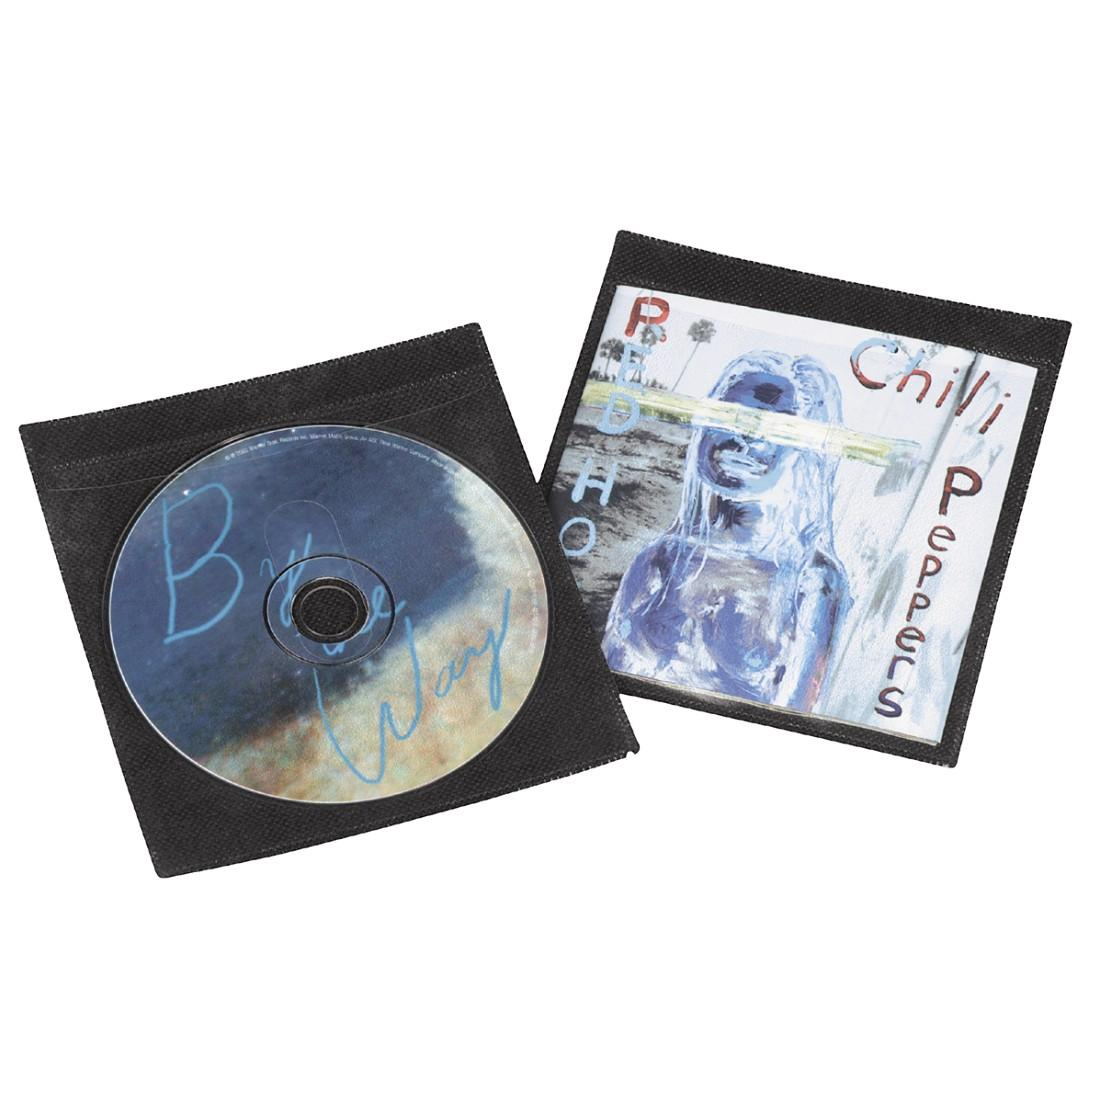 Джоб за 2бр. CD-та без обложка- 25бр/опаковка HAMA, Черен